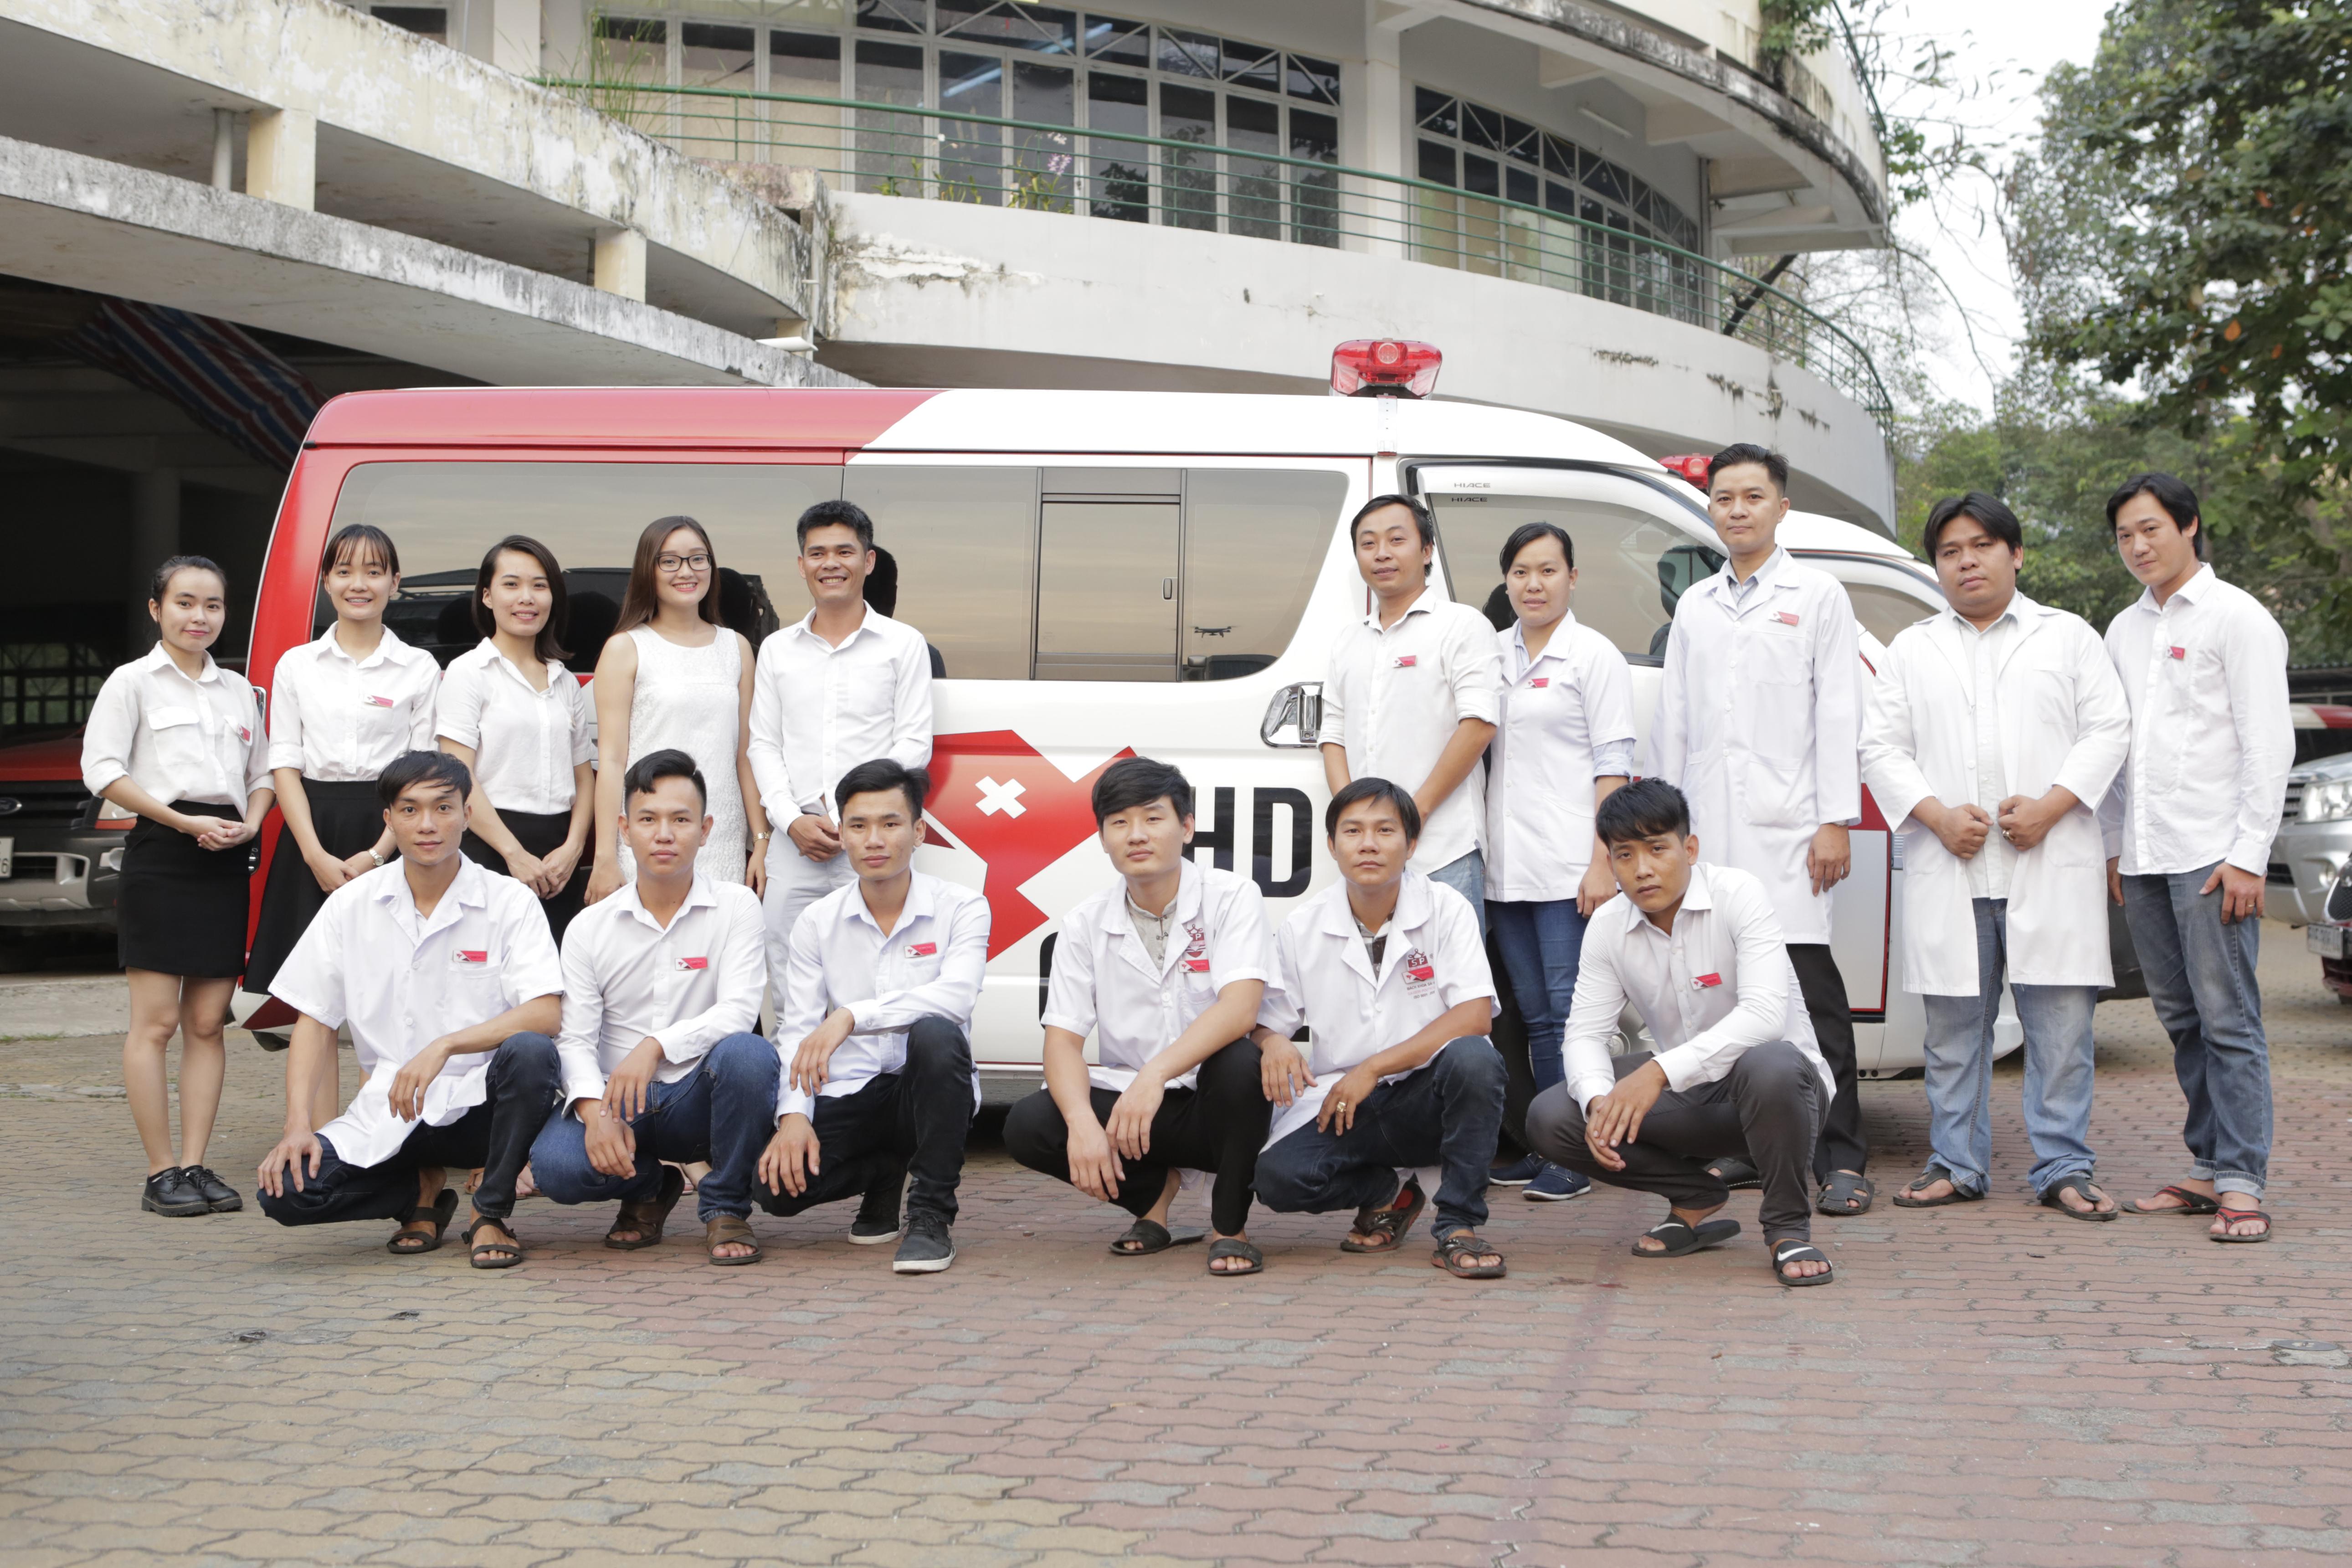 Đội ngũ xe cấp cứu HDCare